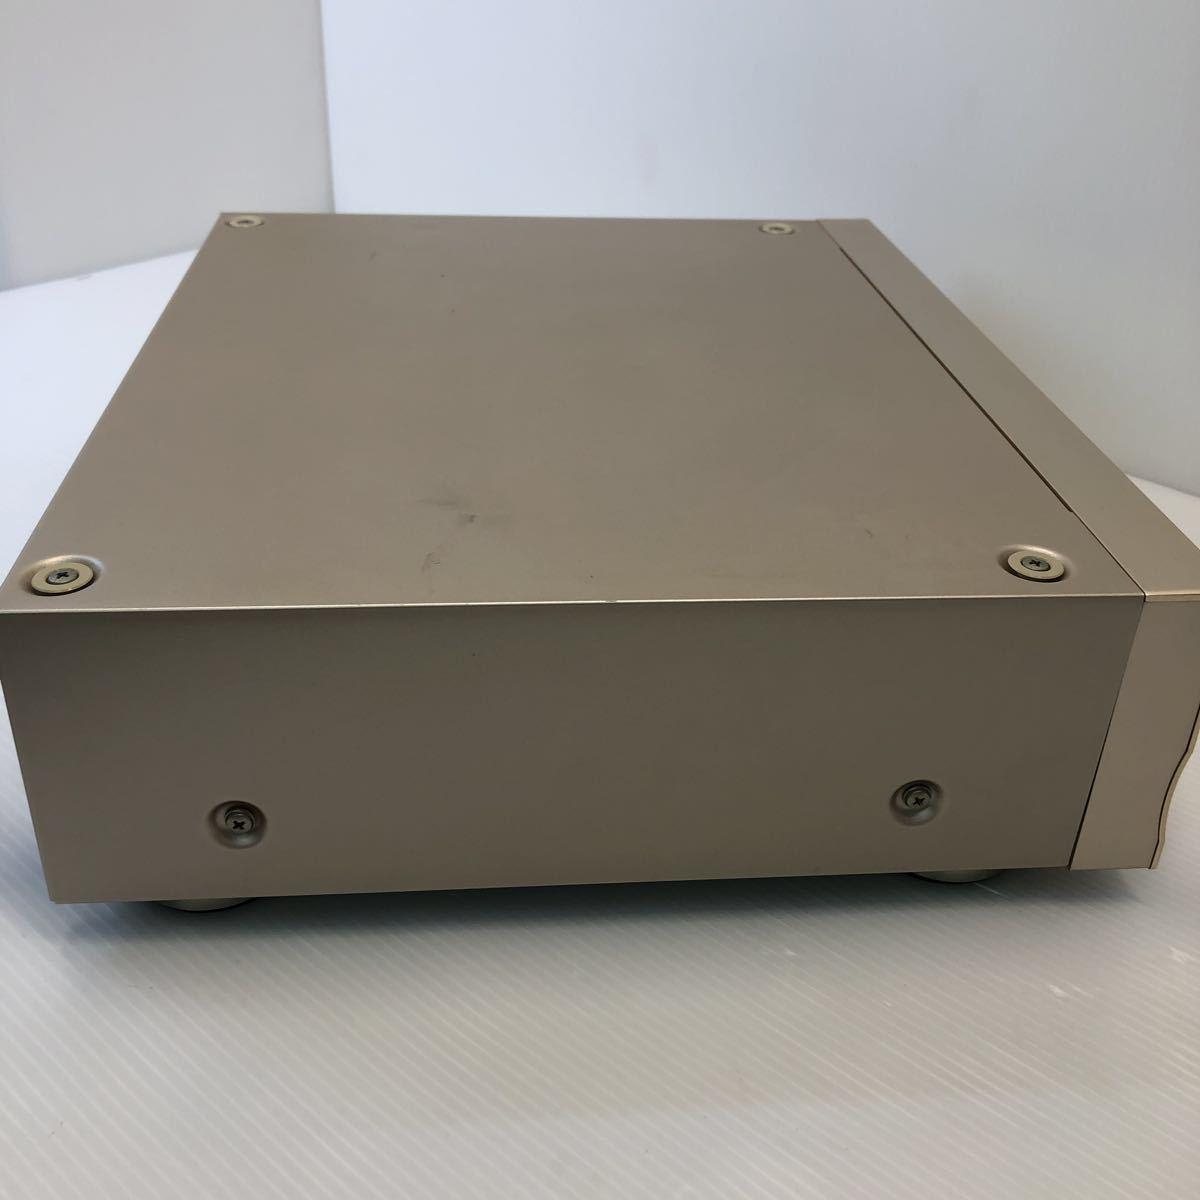 Pioneer パイオニア CDプレーヤー DACモード搭載 通電 CDトレイオープンクローズのみ確認 ジャンク扱い リモコン付き 1円スタート_画像9